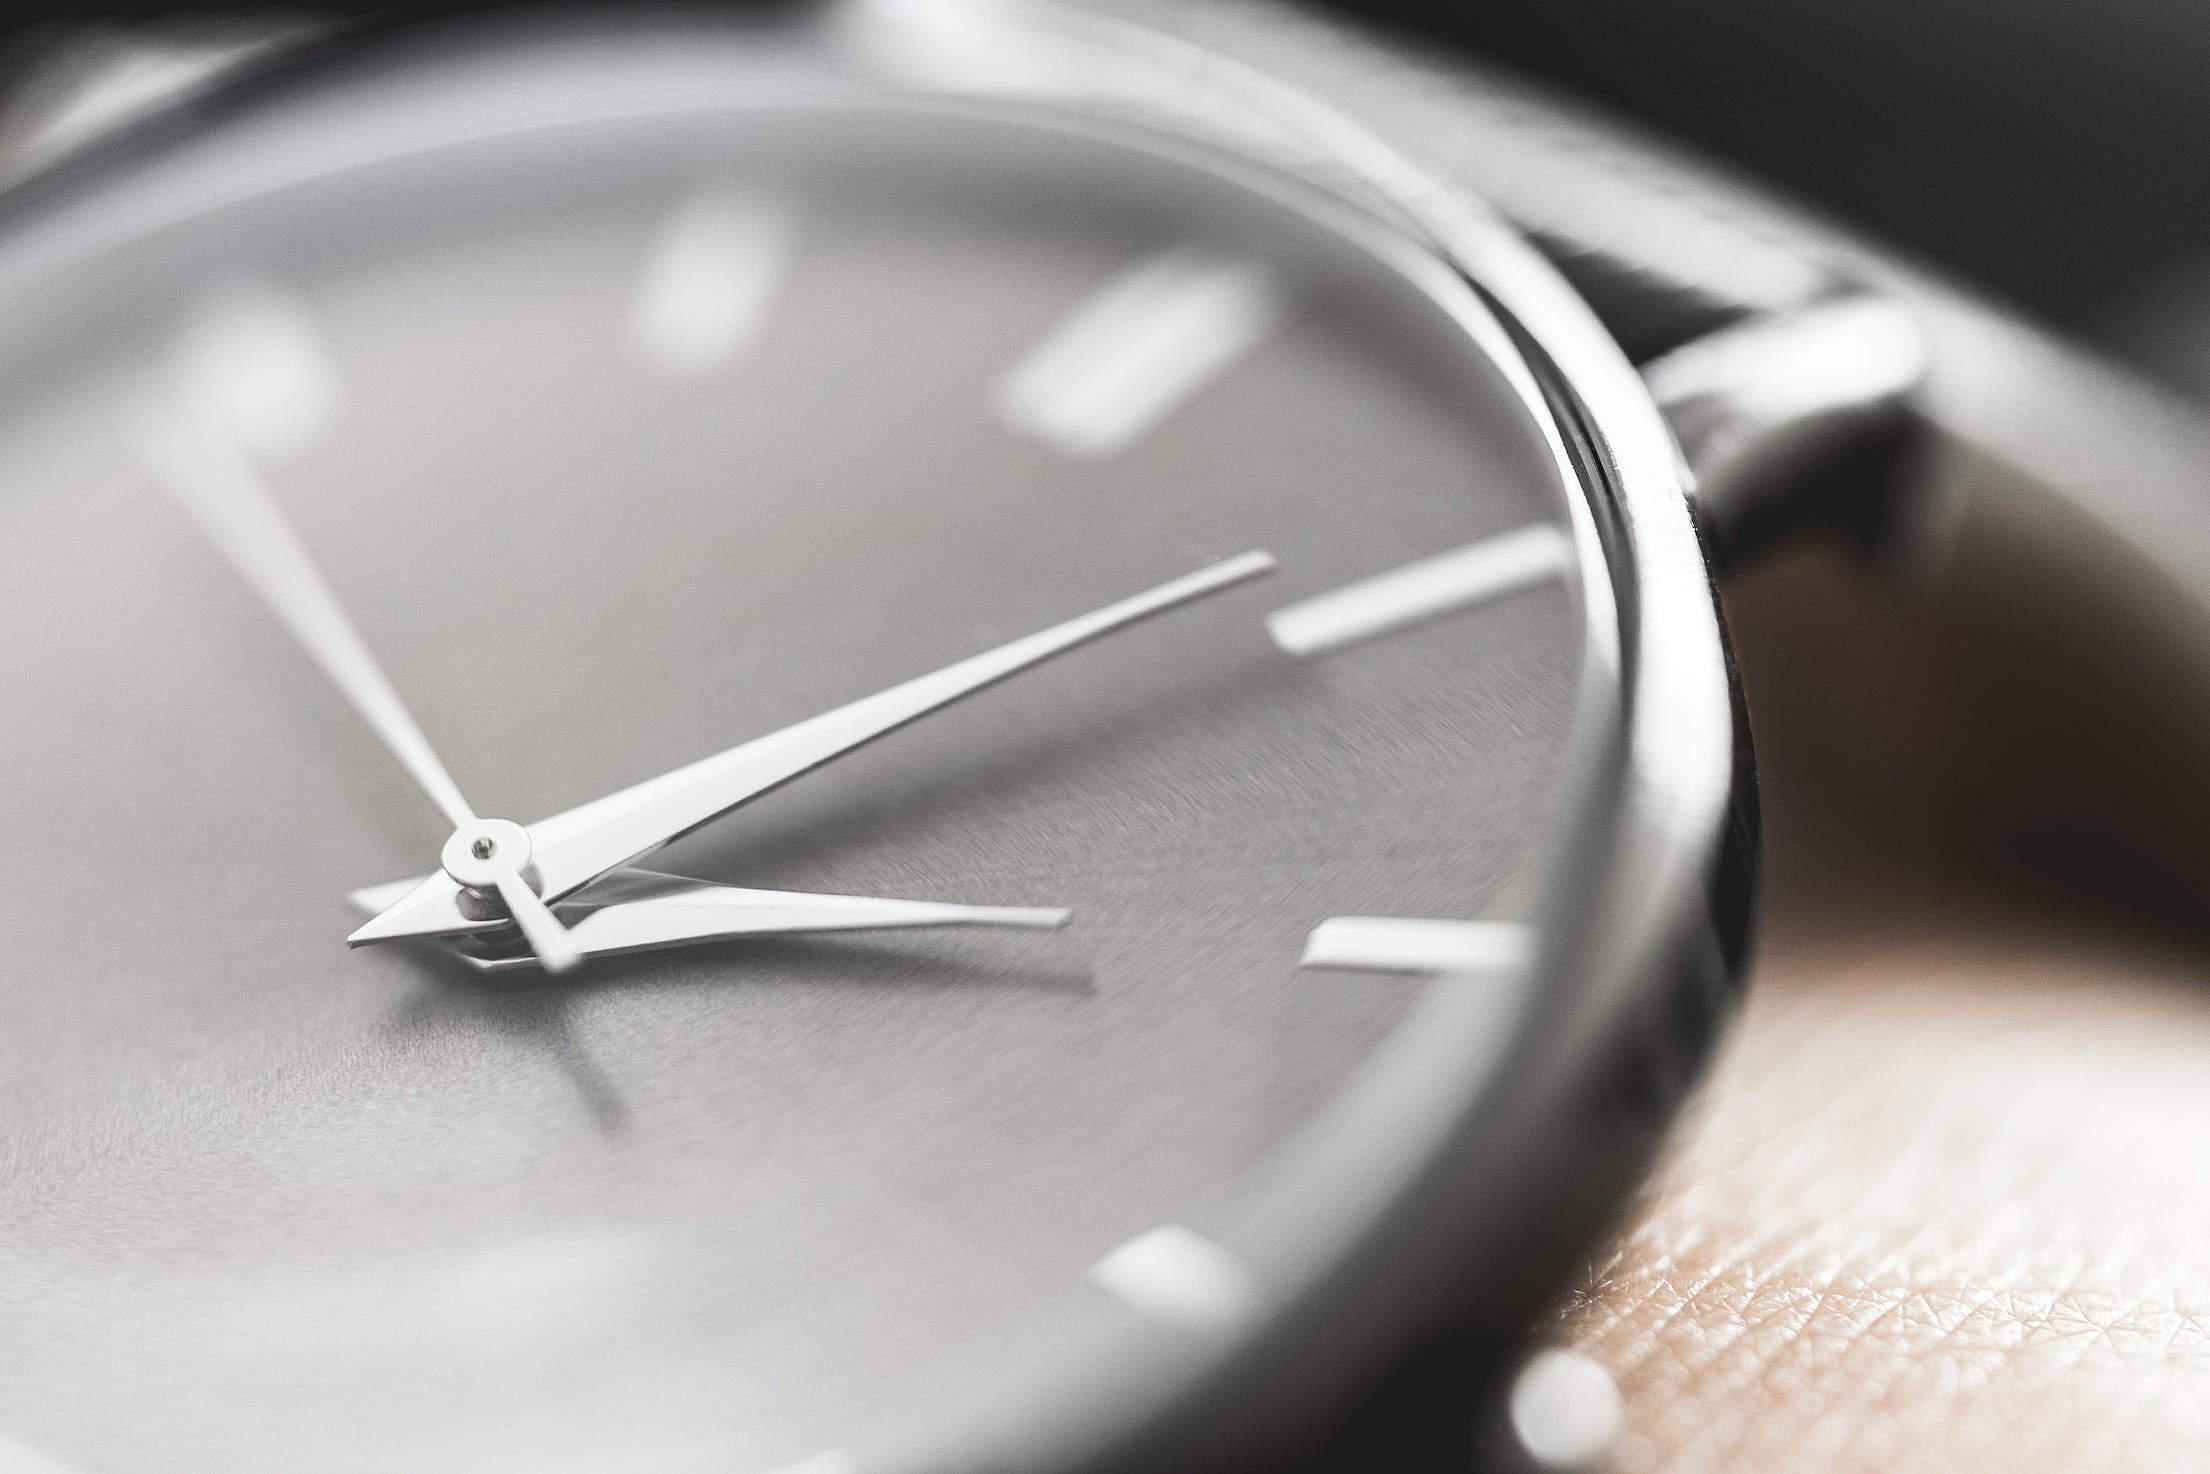 Classic Minimalistic Watches on Wrist Close Up Free Stock Photo